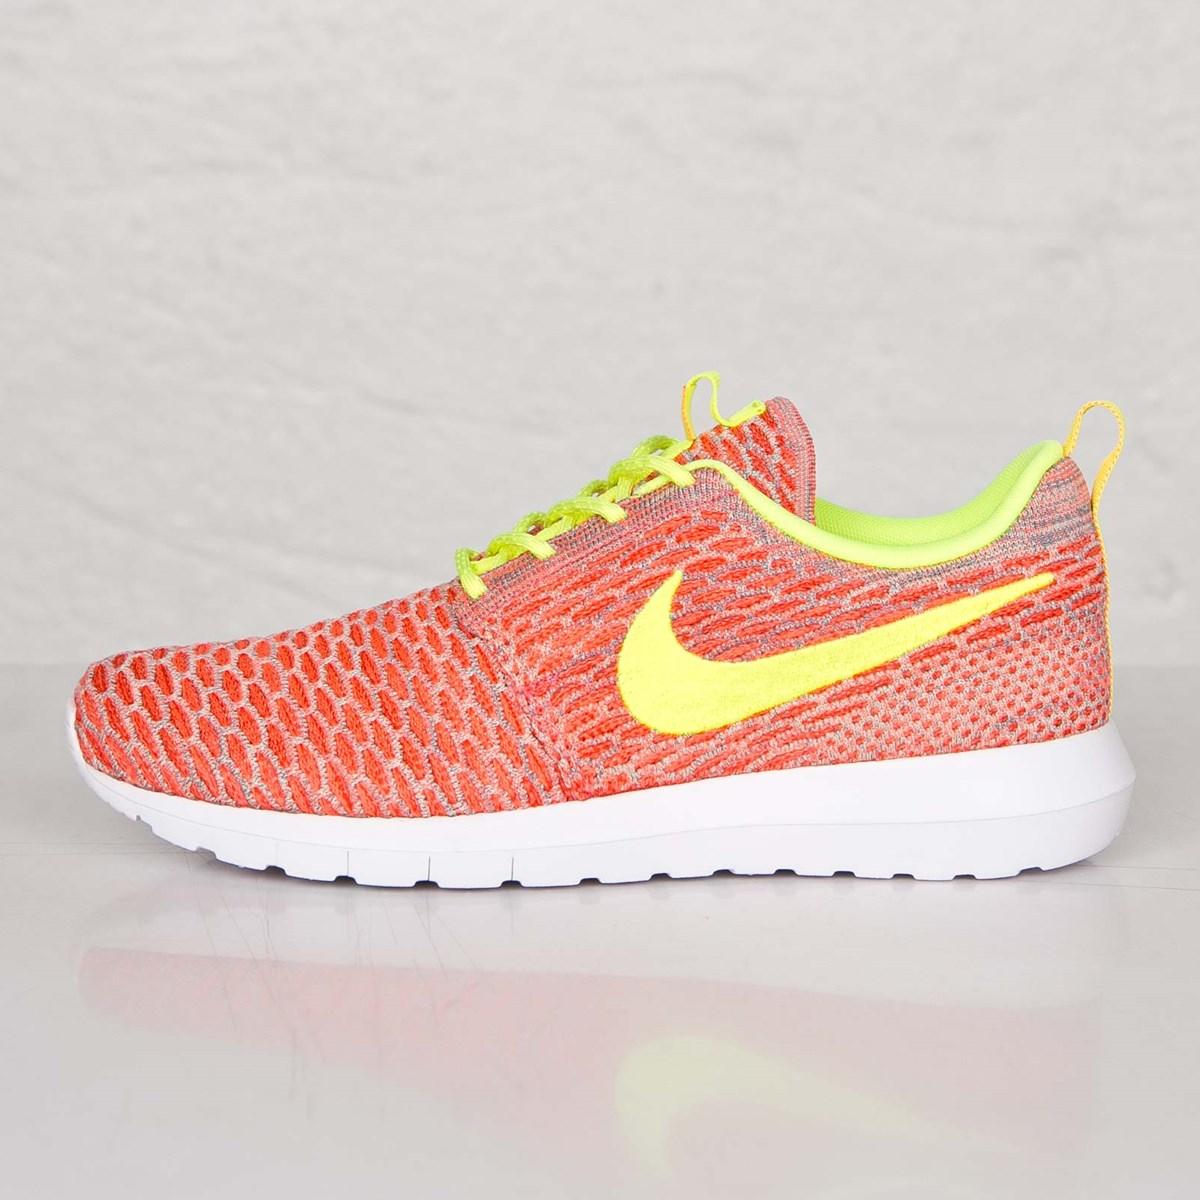 11c748d8f882 Nike Roshe NM Flyknit - 677243-800 - Sneakersnstuff